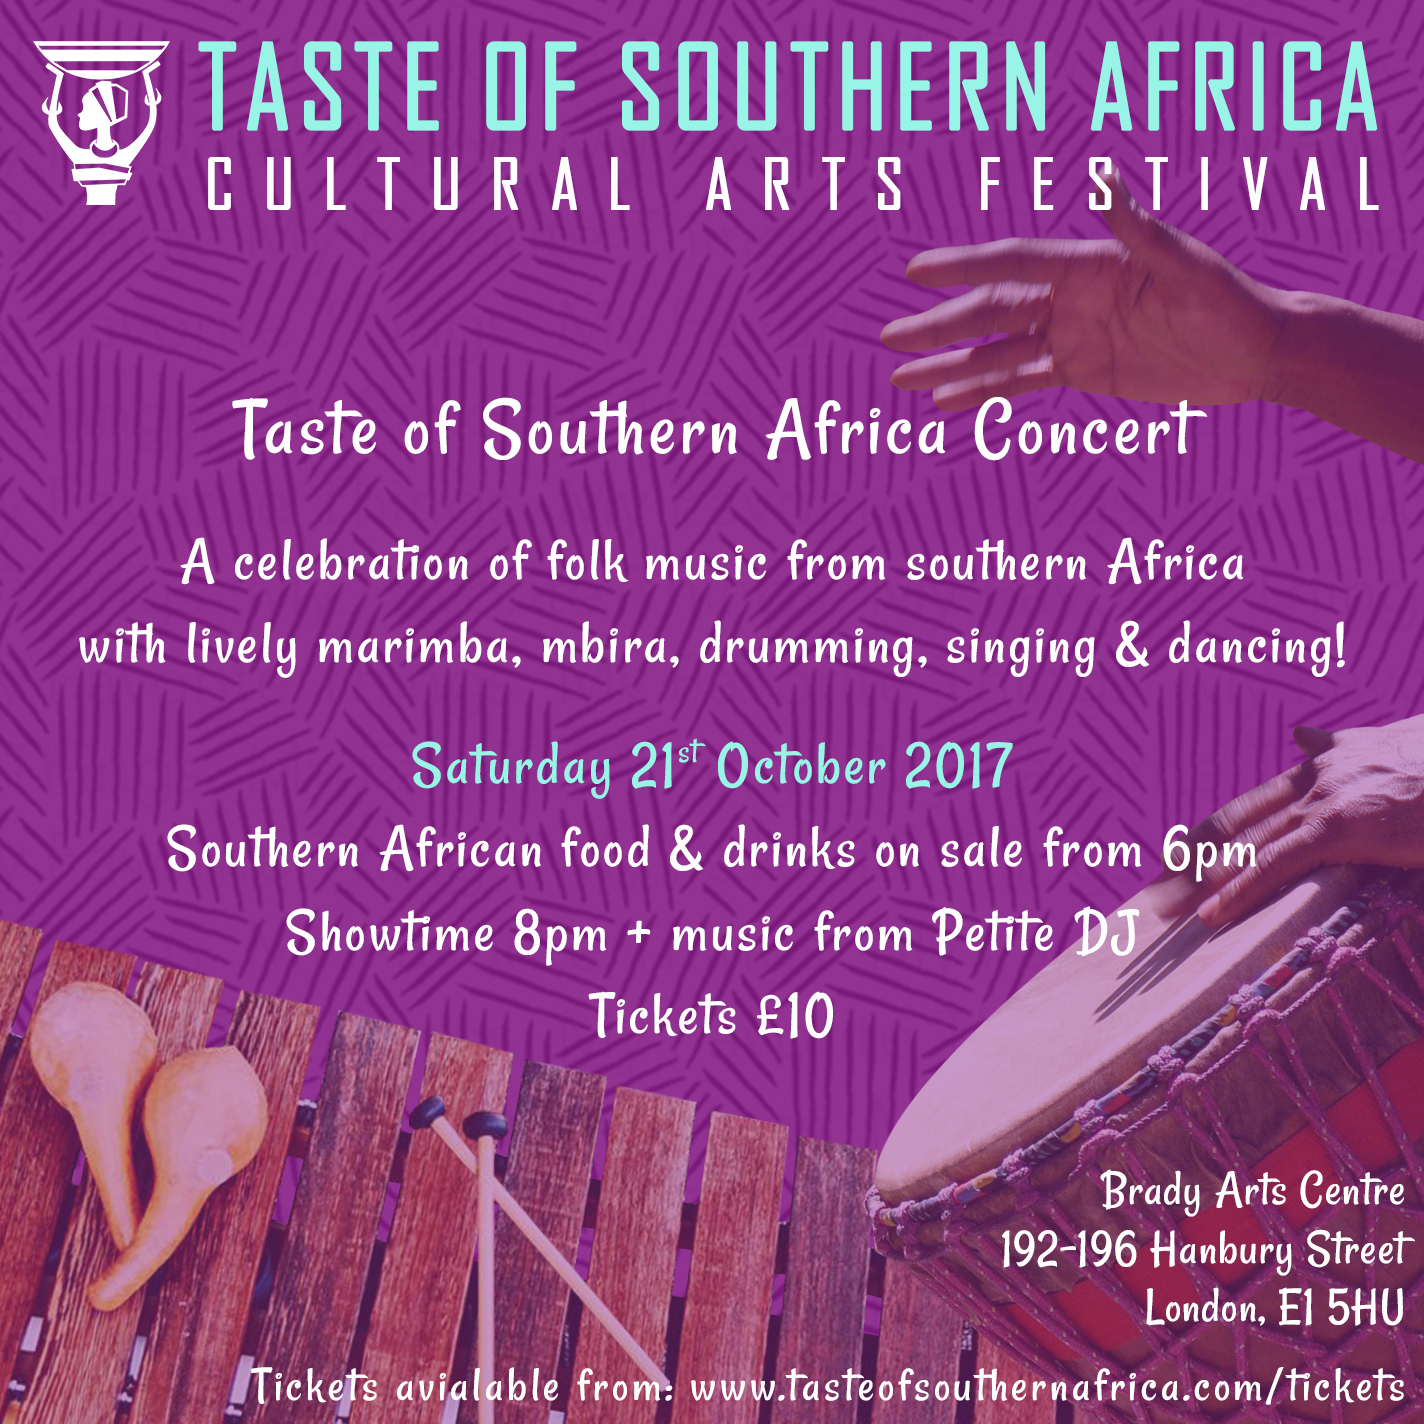 Taste-of-Southern-Africa-Concert.jpg